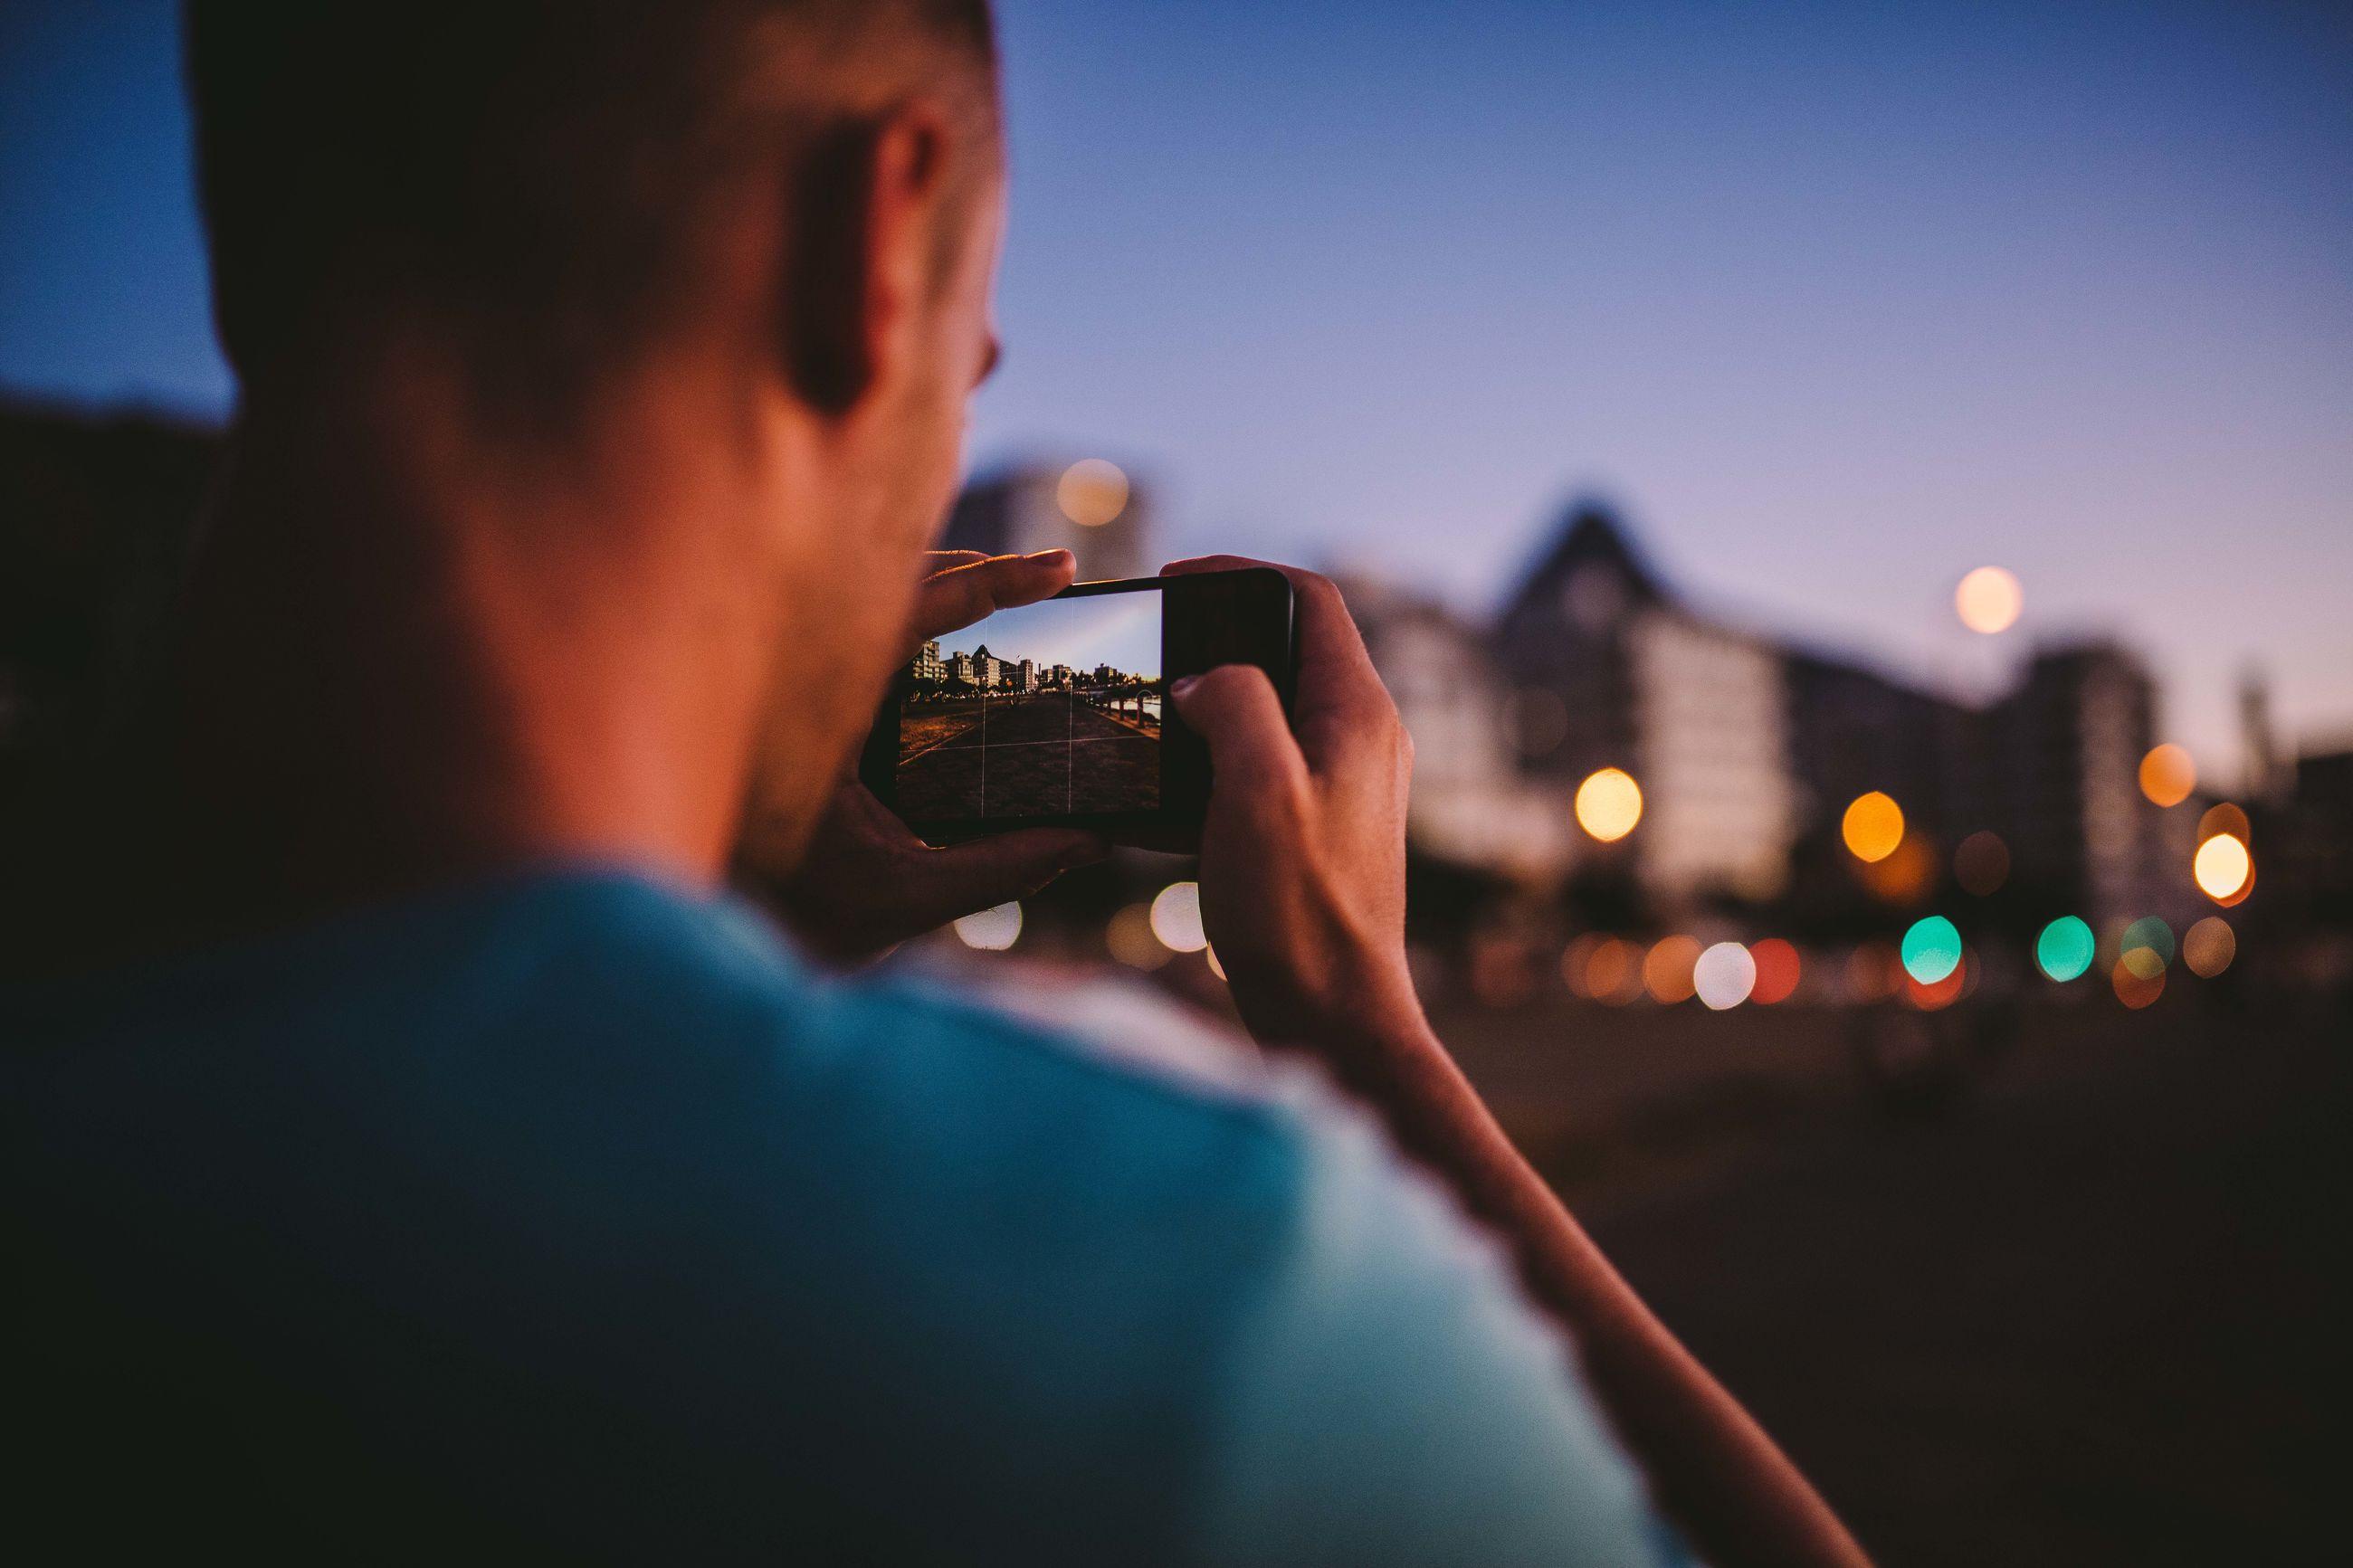 Close-up of man photographing illuminated city